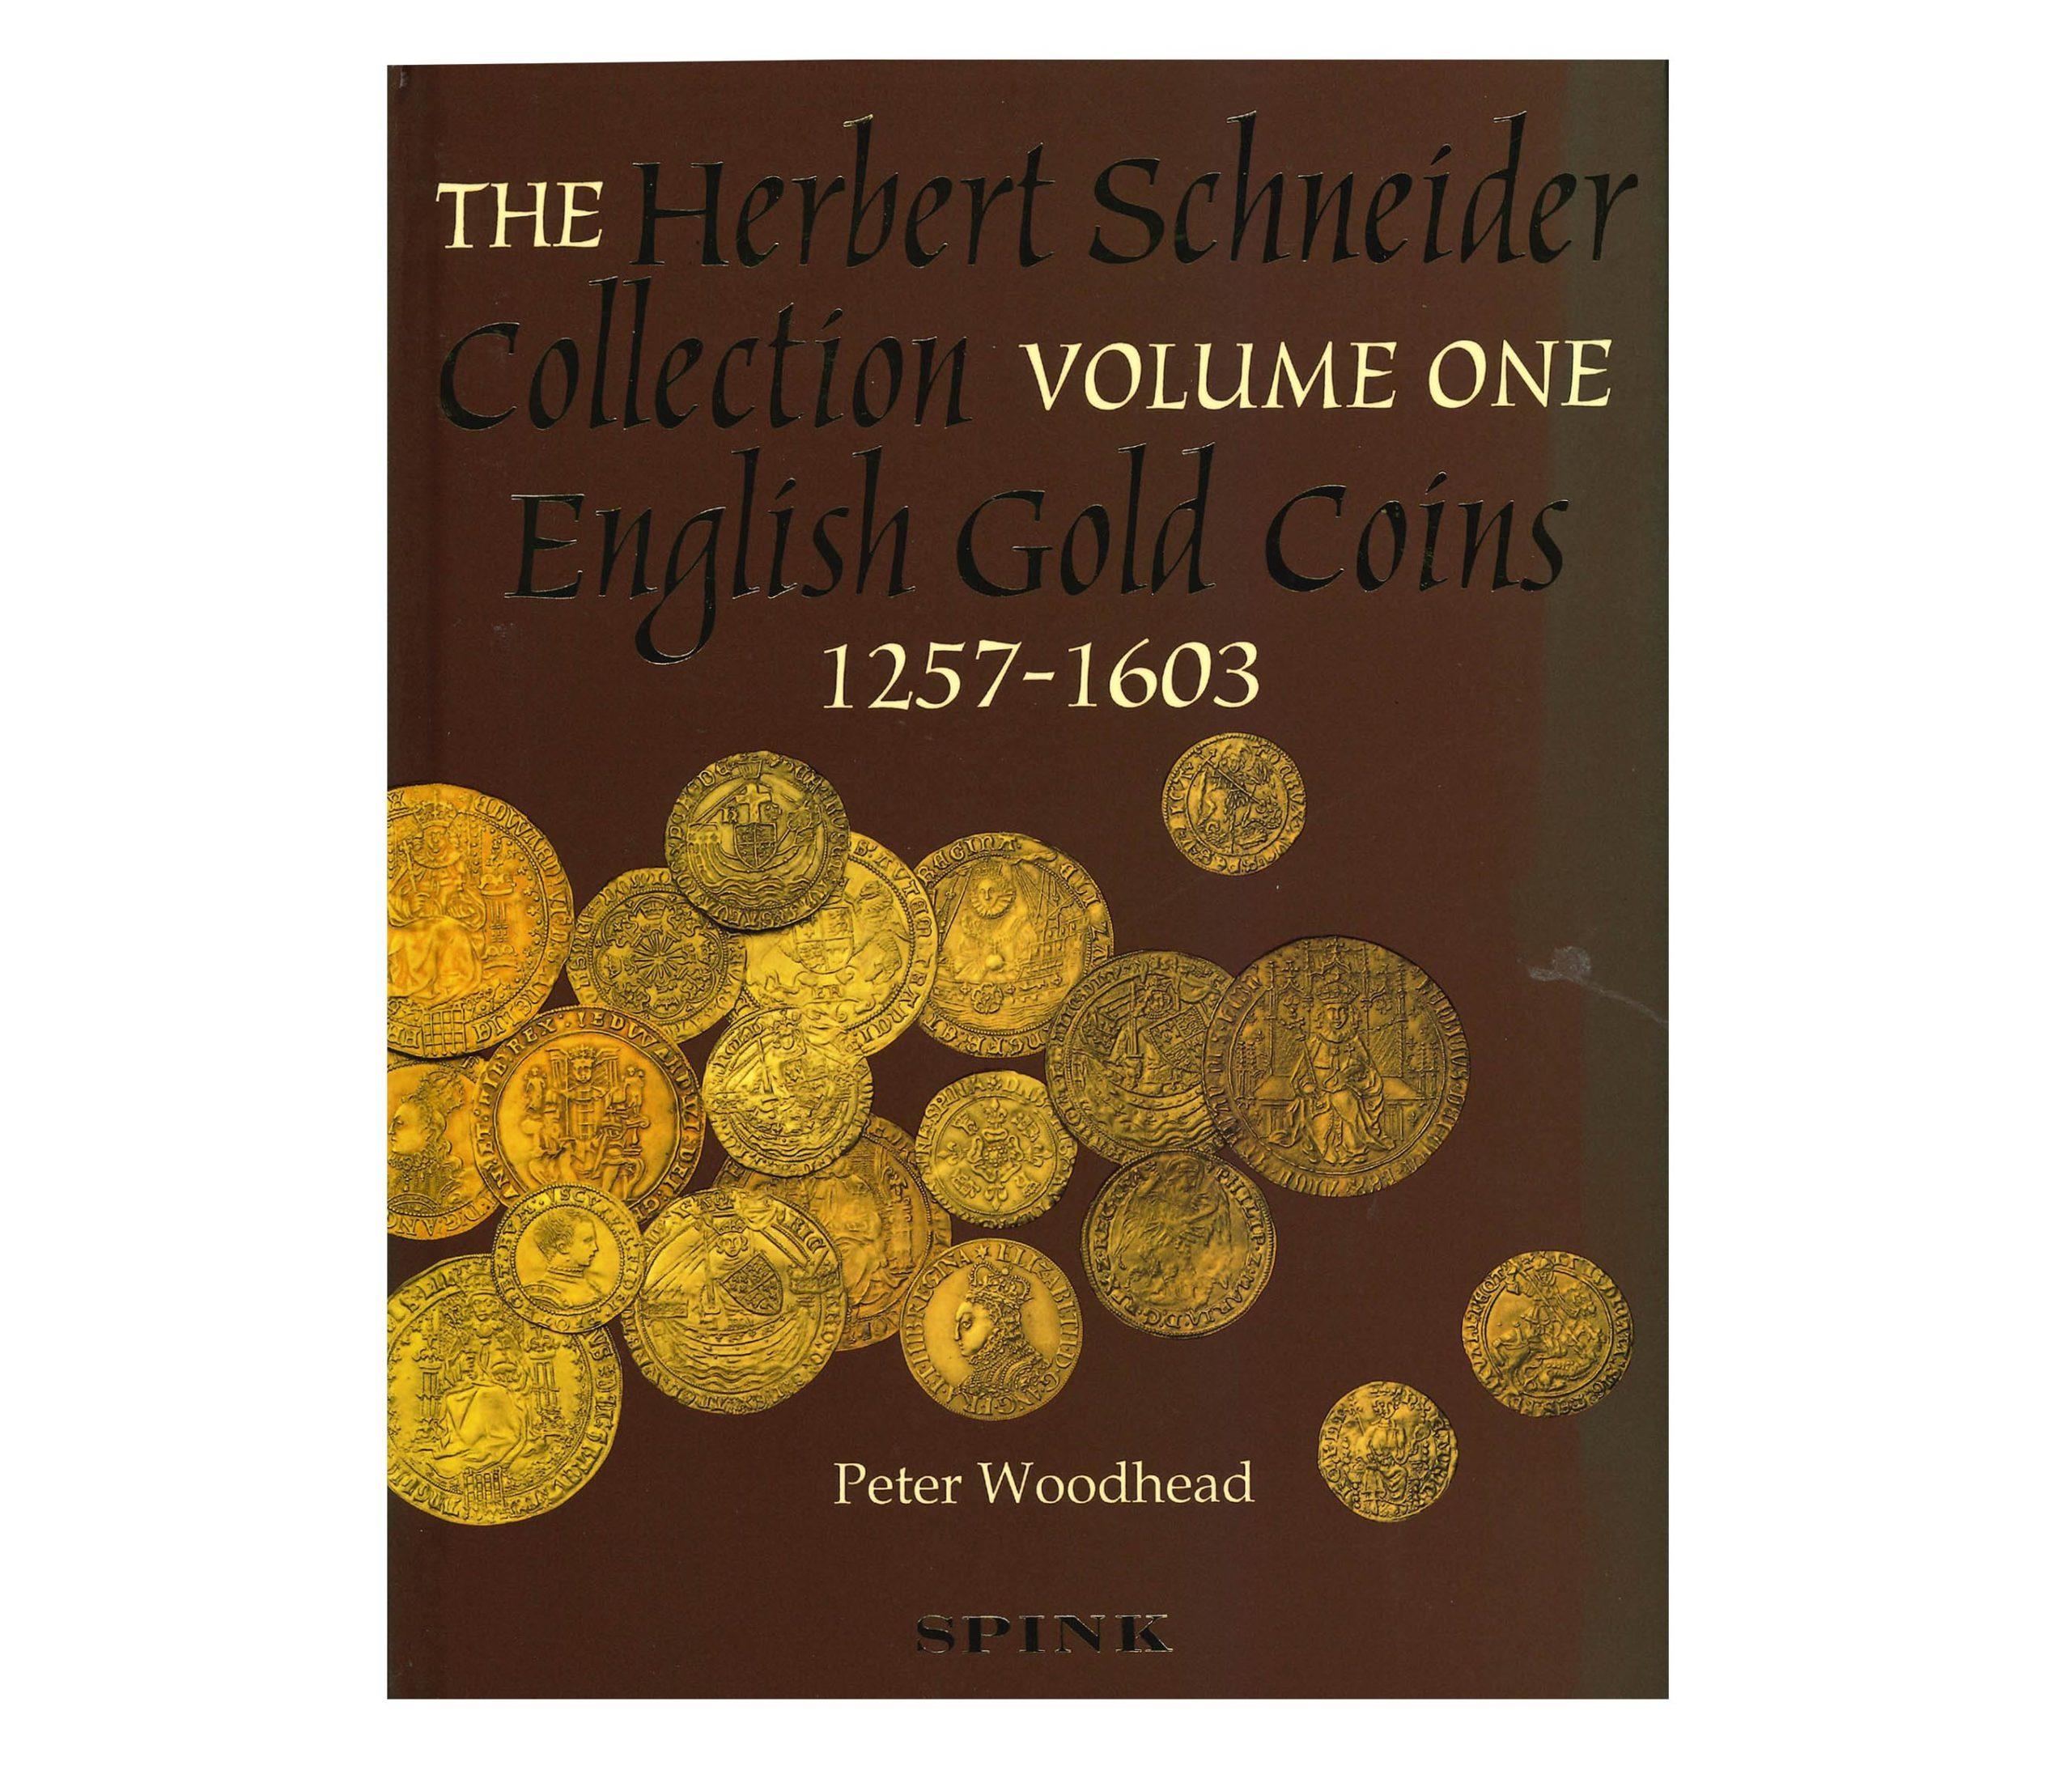 The Herbert Schneider Collection. Volume One - English Gold Coins, 1257-1603